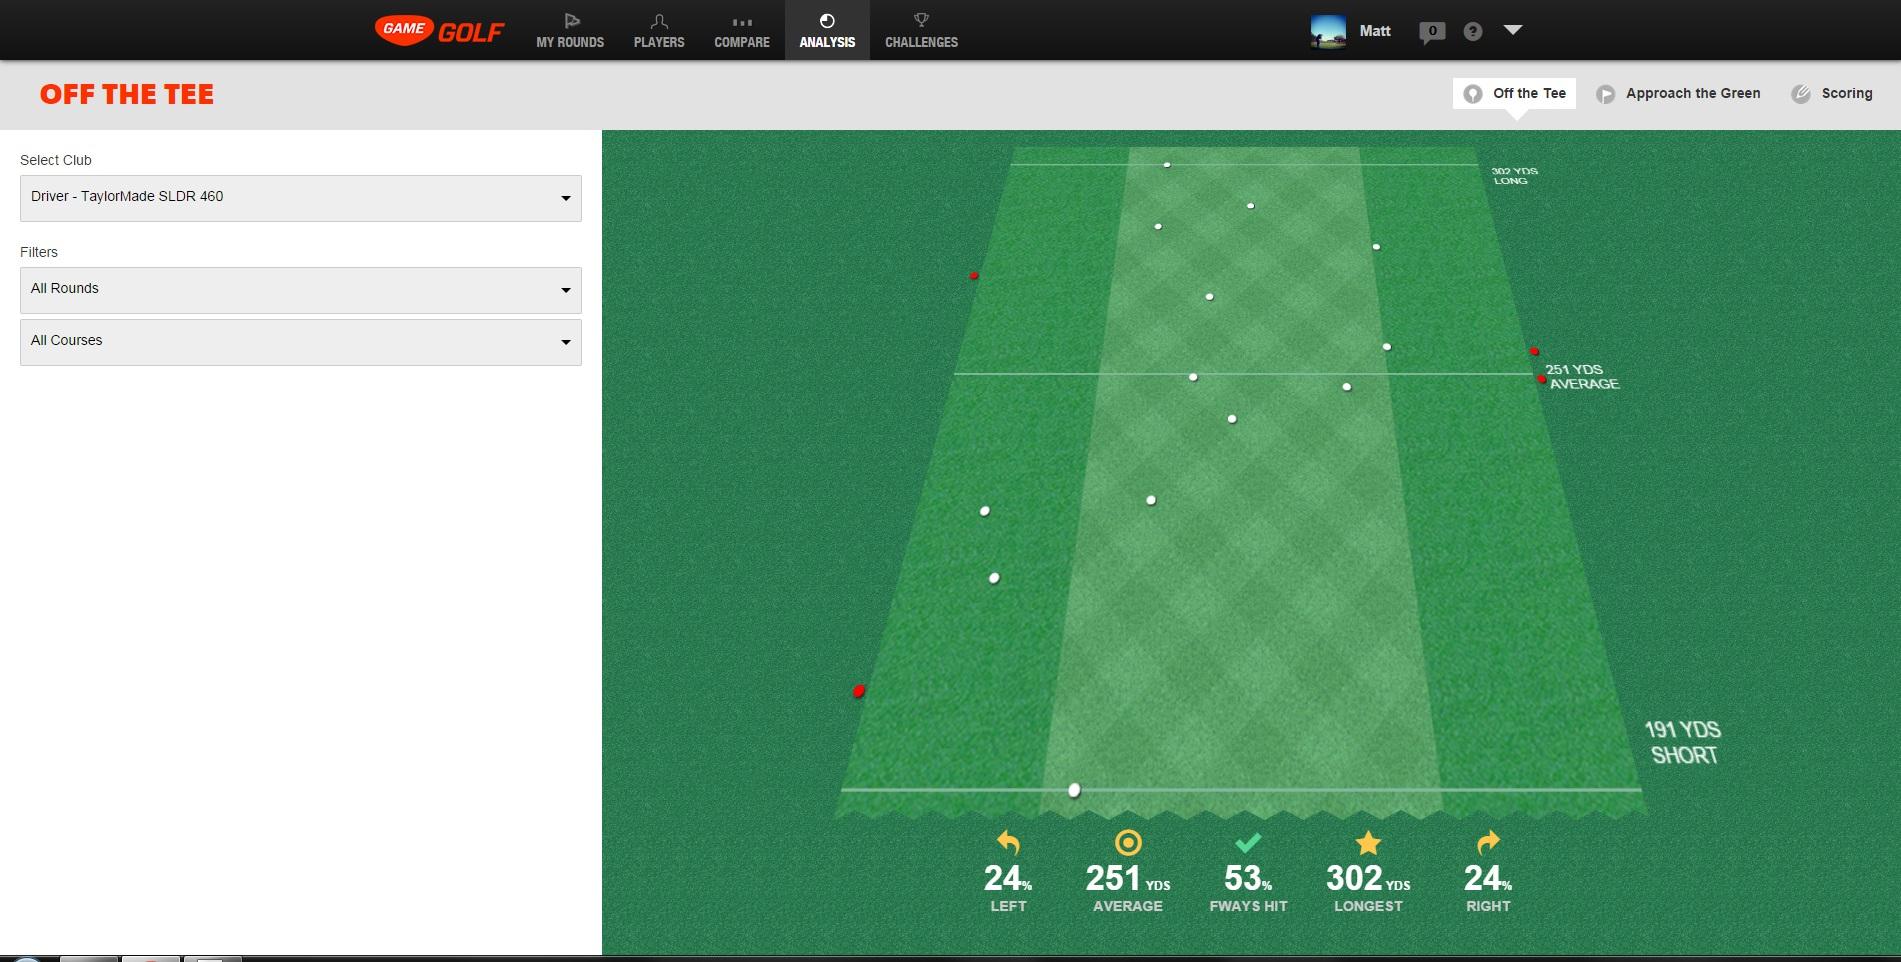 Game Golf - Driver Analysis